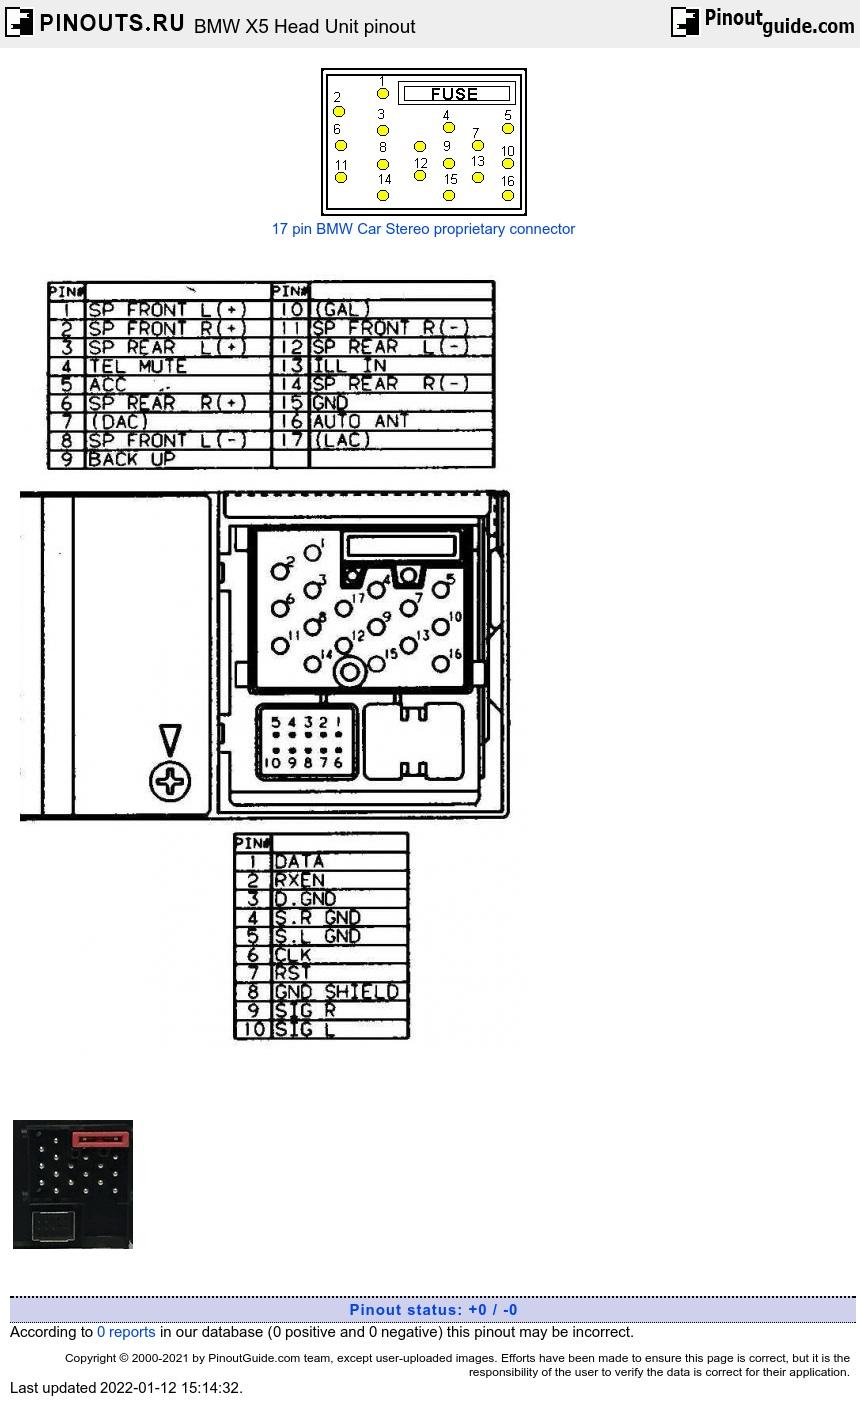 BMW X5 Head Unit pinout diagram @ pinoutguide.com